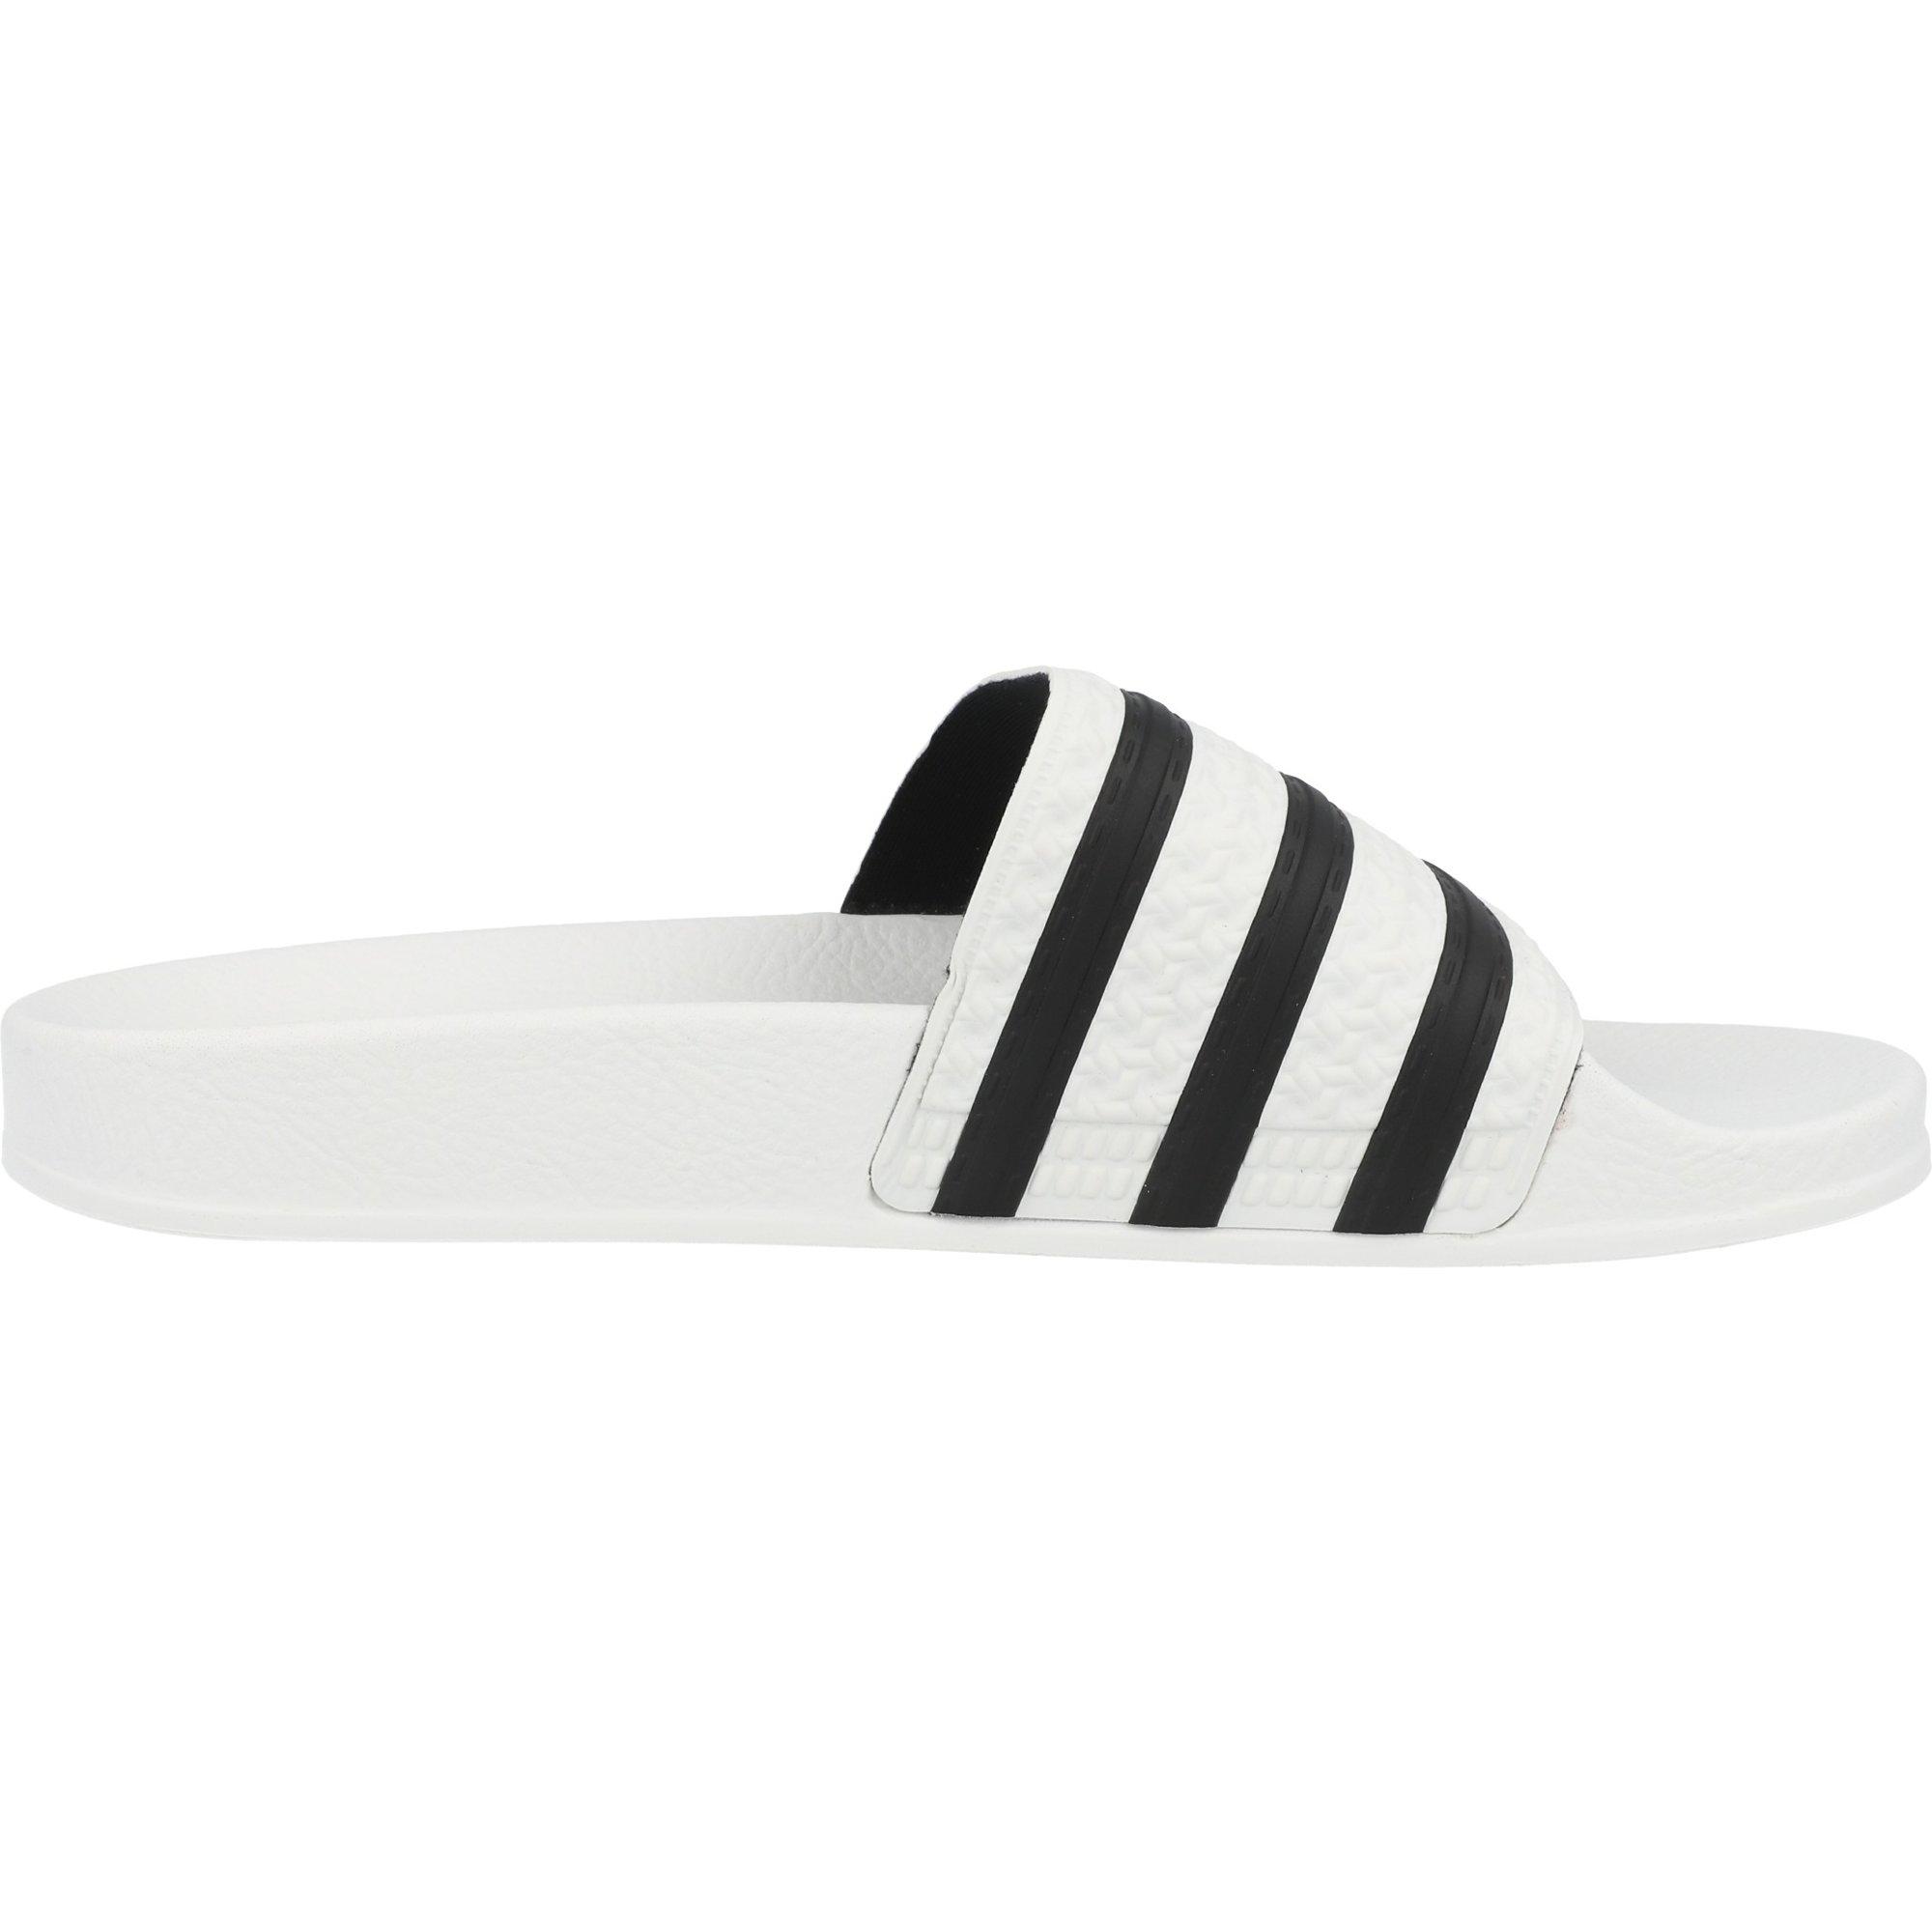 adidas Originals adilette White/Core Black Synthetic